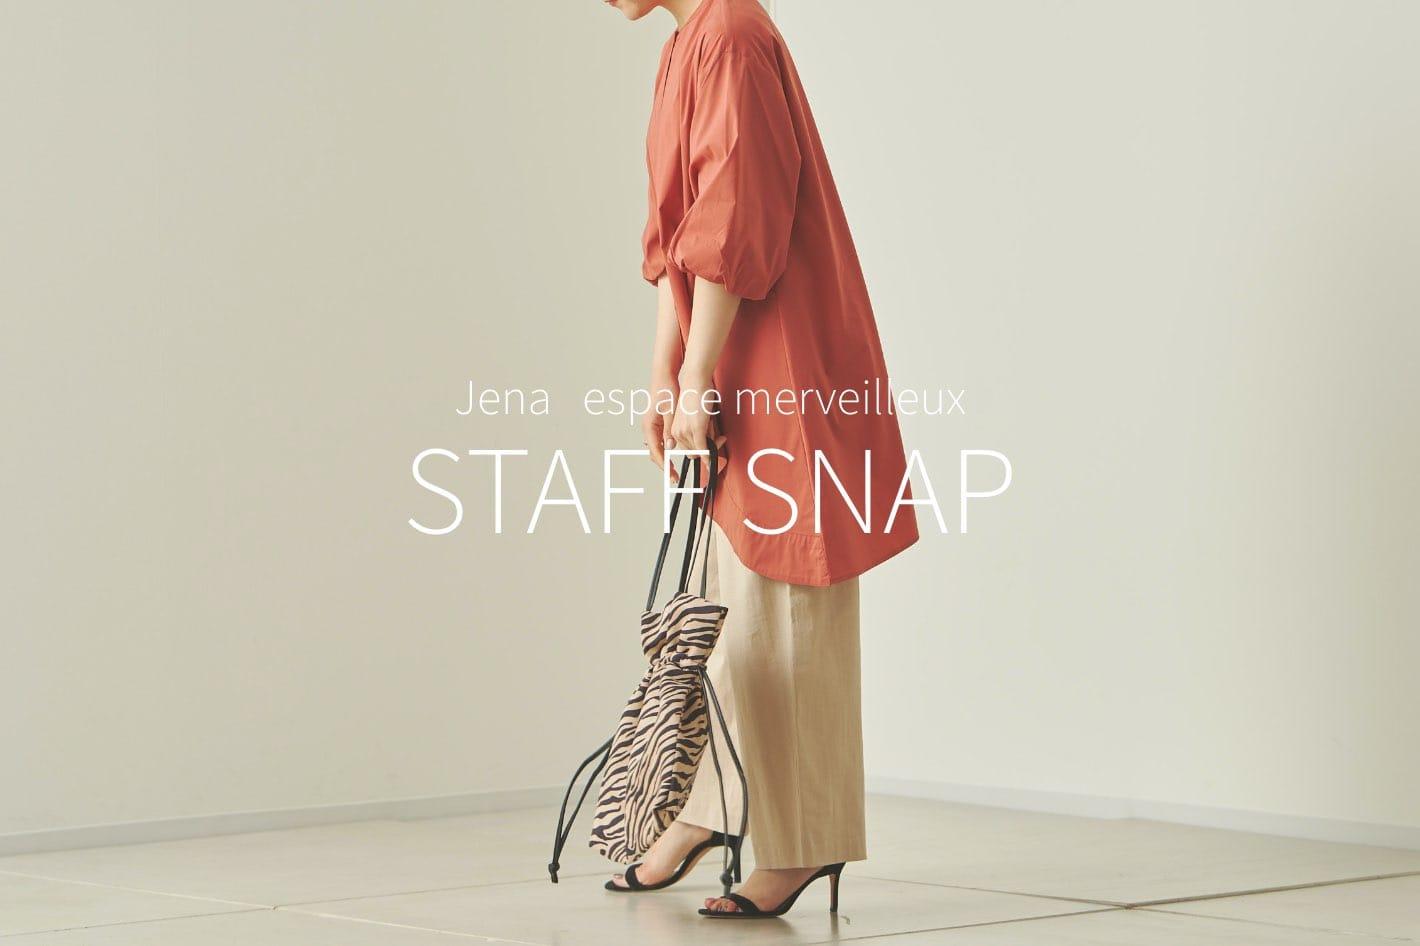 Jena espace merveilleux STAFF SNAP #1|新作アイテムで作る、autumn style